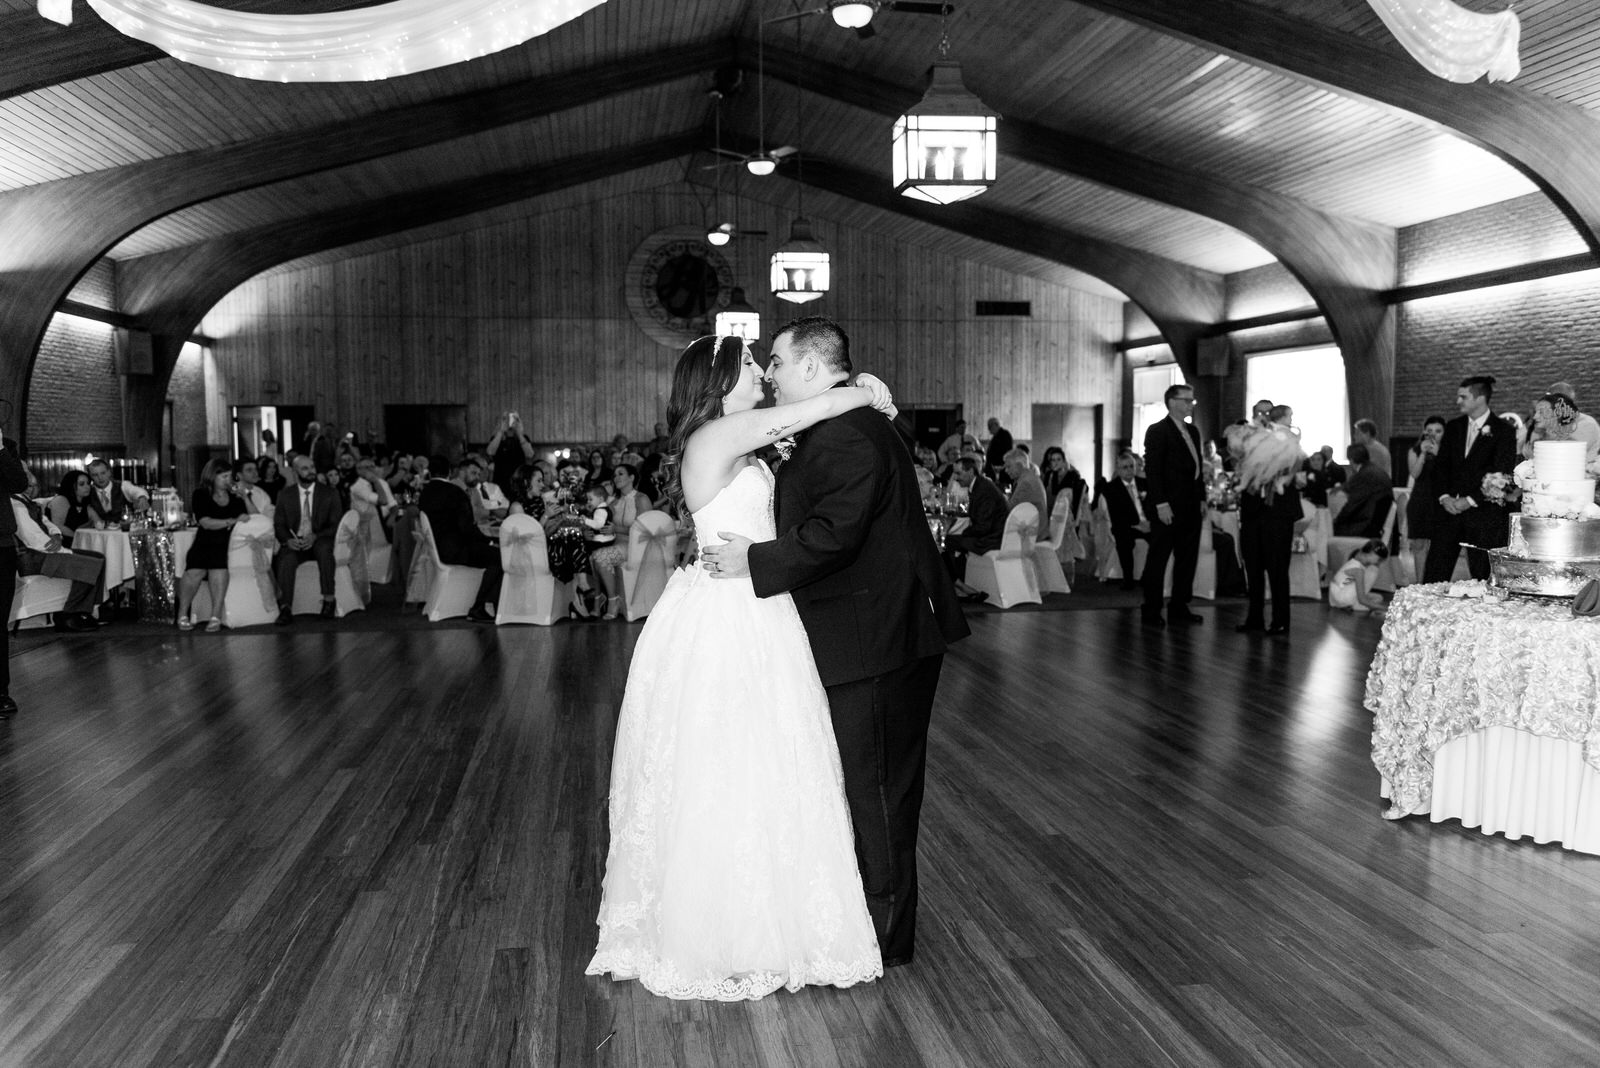 Laube_Banquet_Hall__Wedding_Photos_073.jpg